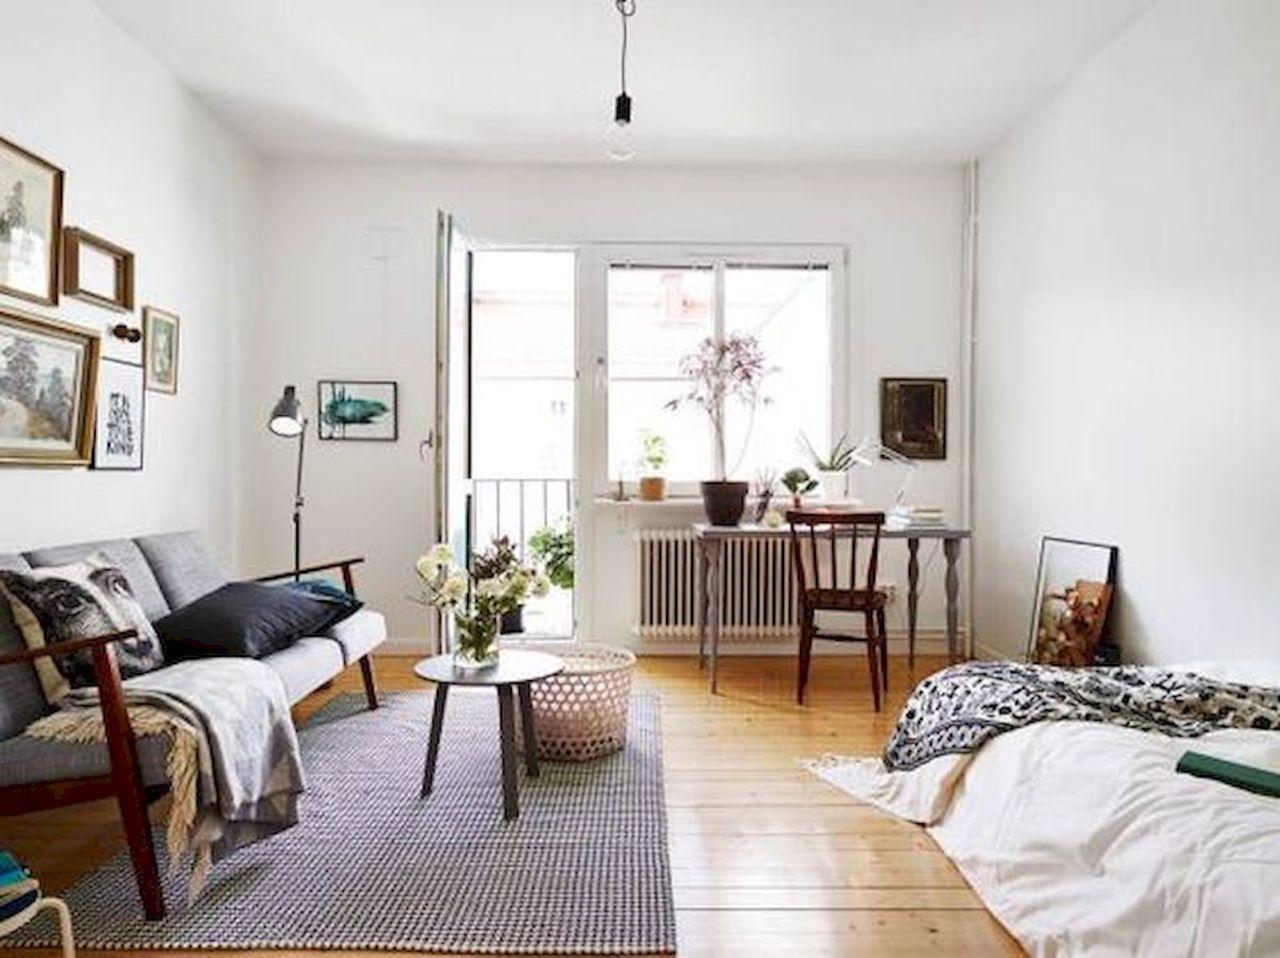 50 Stunning Minimalist Studio Apartment Small Spaces Decor Ideas